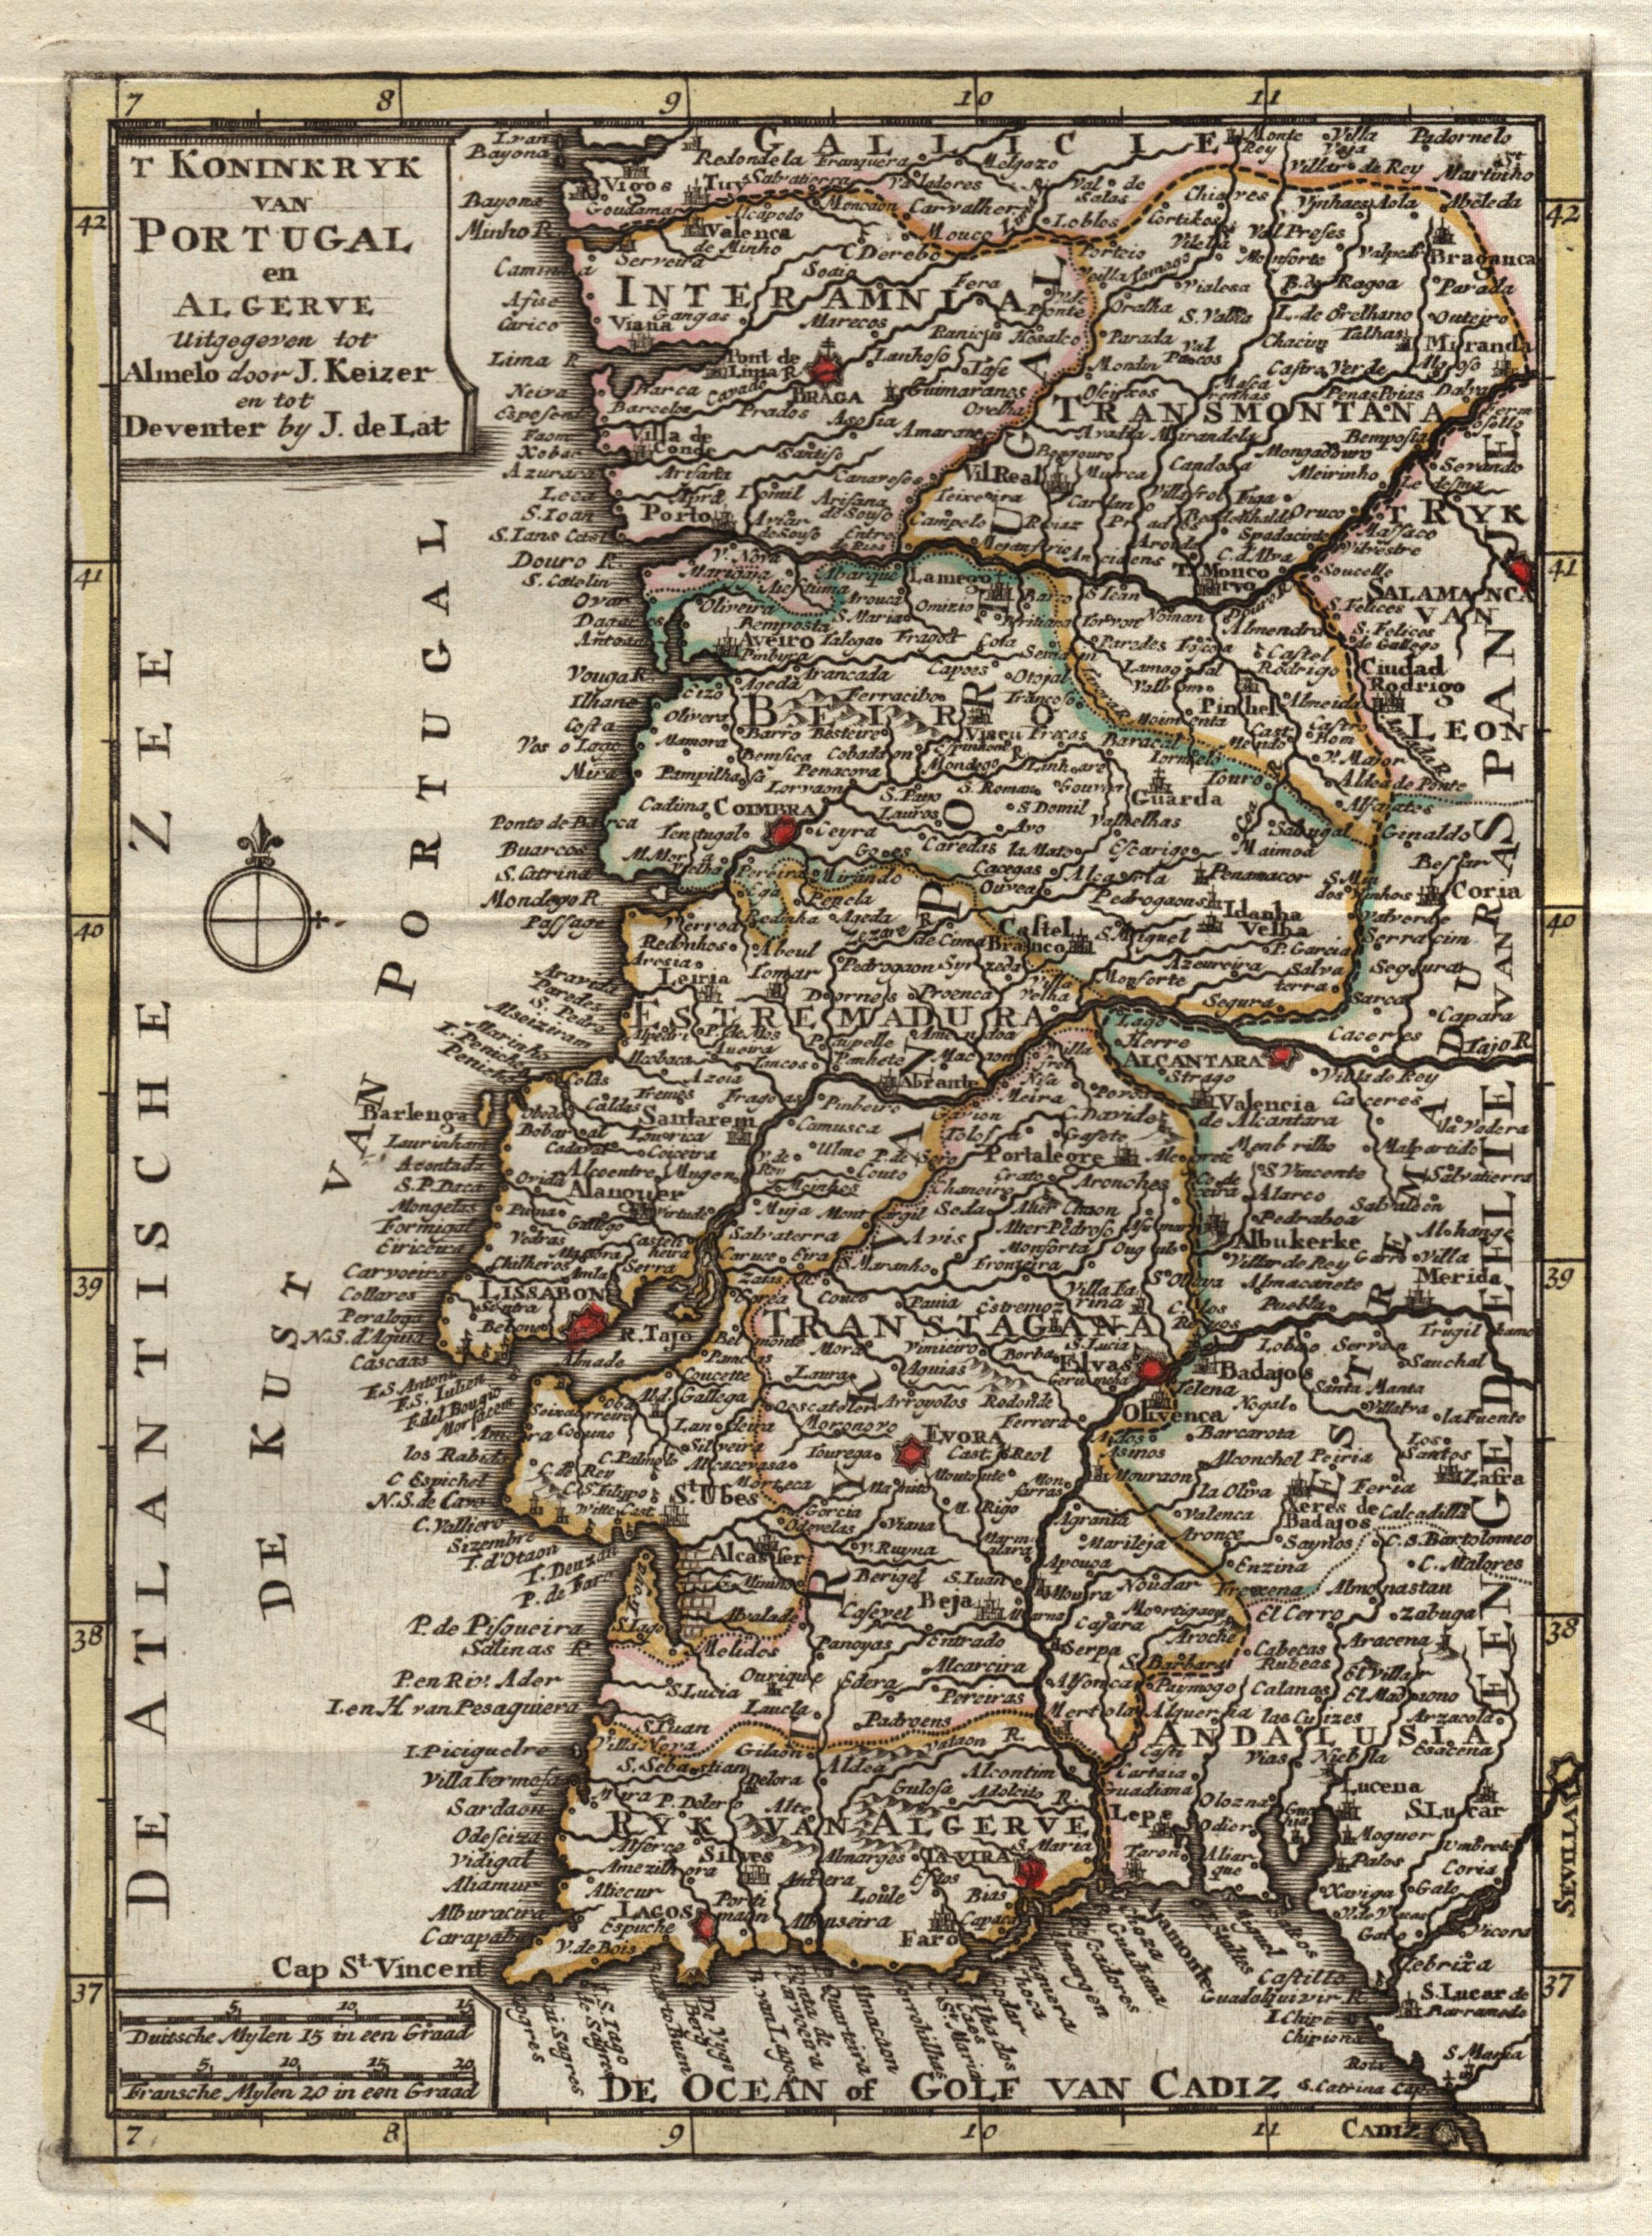 Porto Portugal Karte.Kupferstich Karte N J Keizer U Jan De